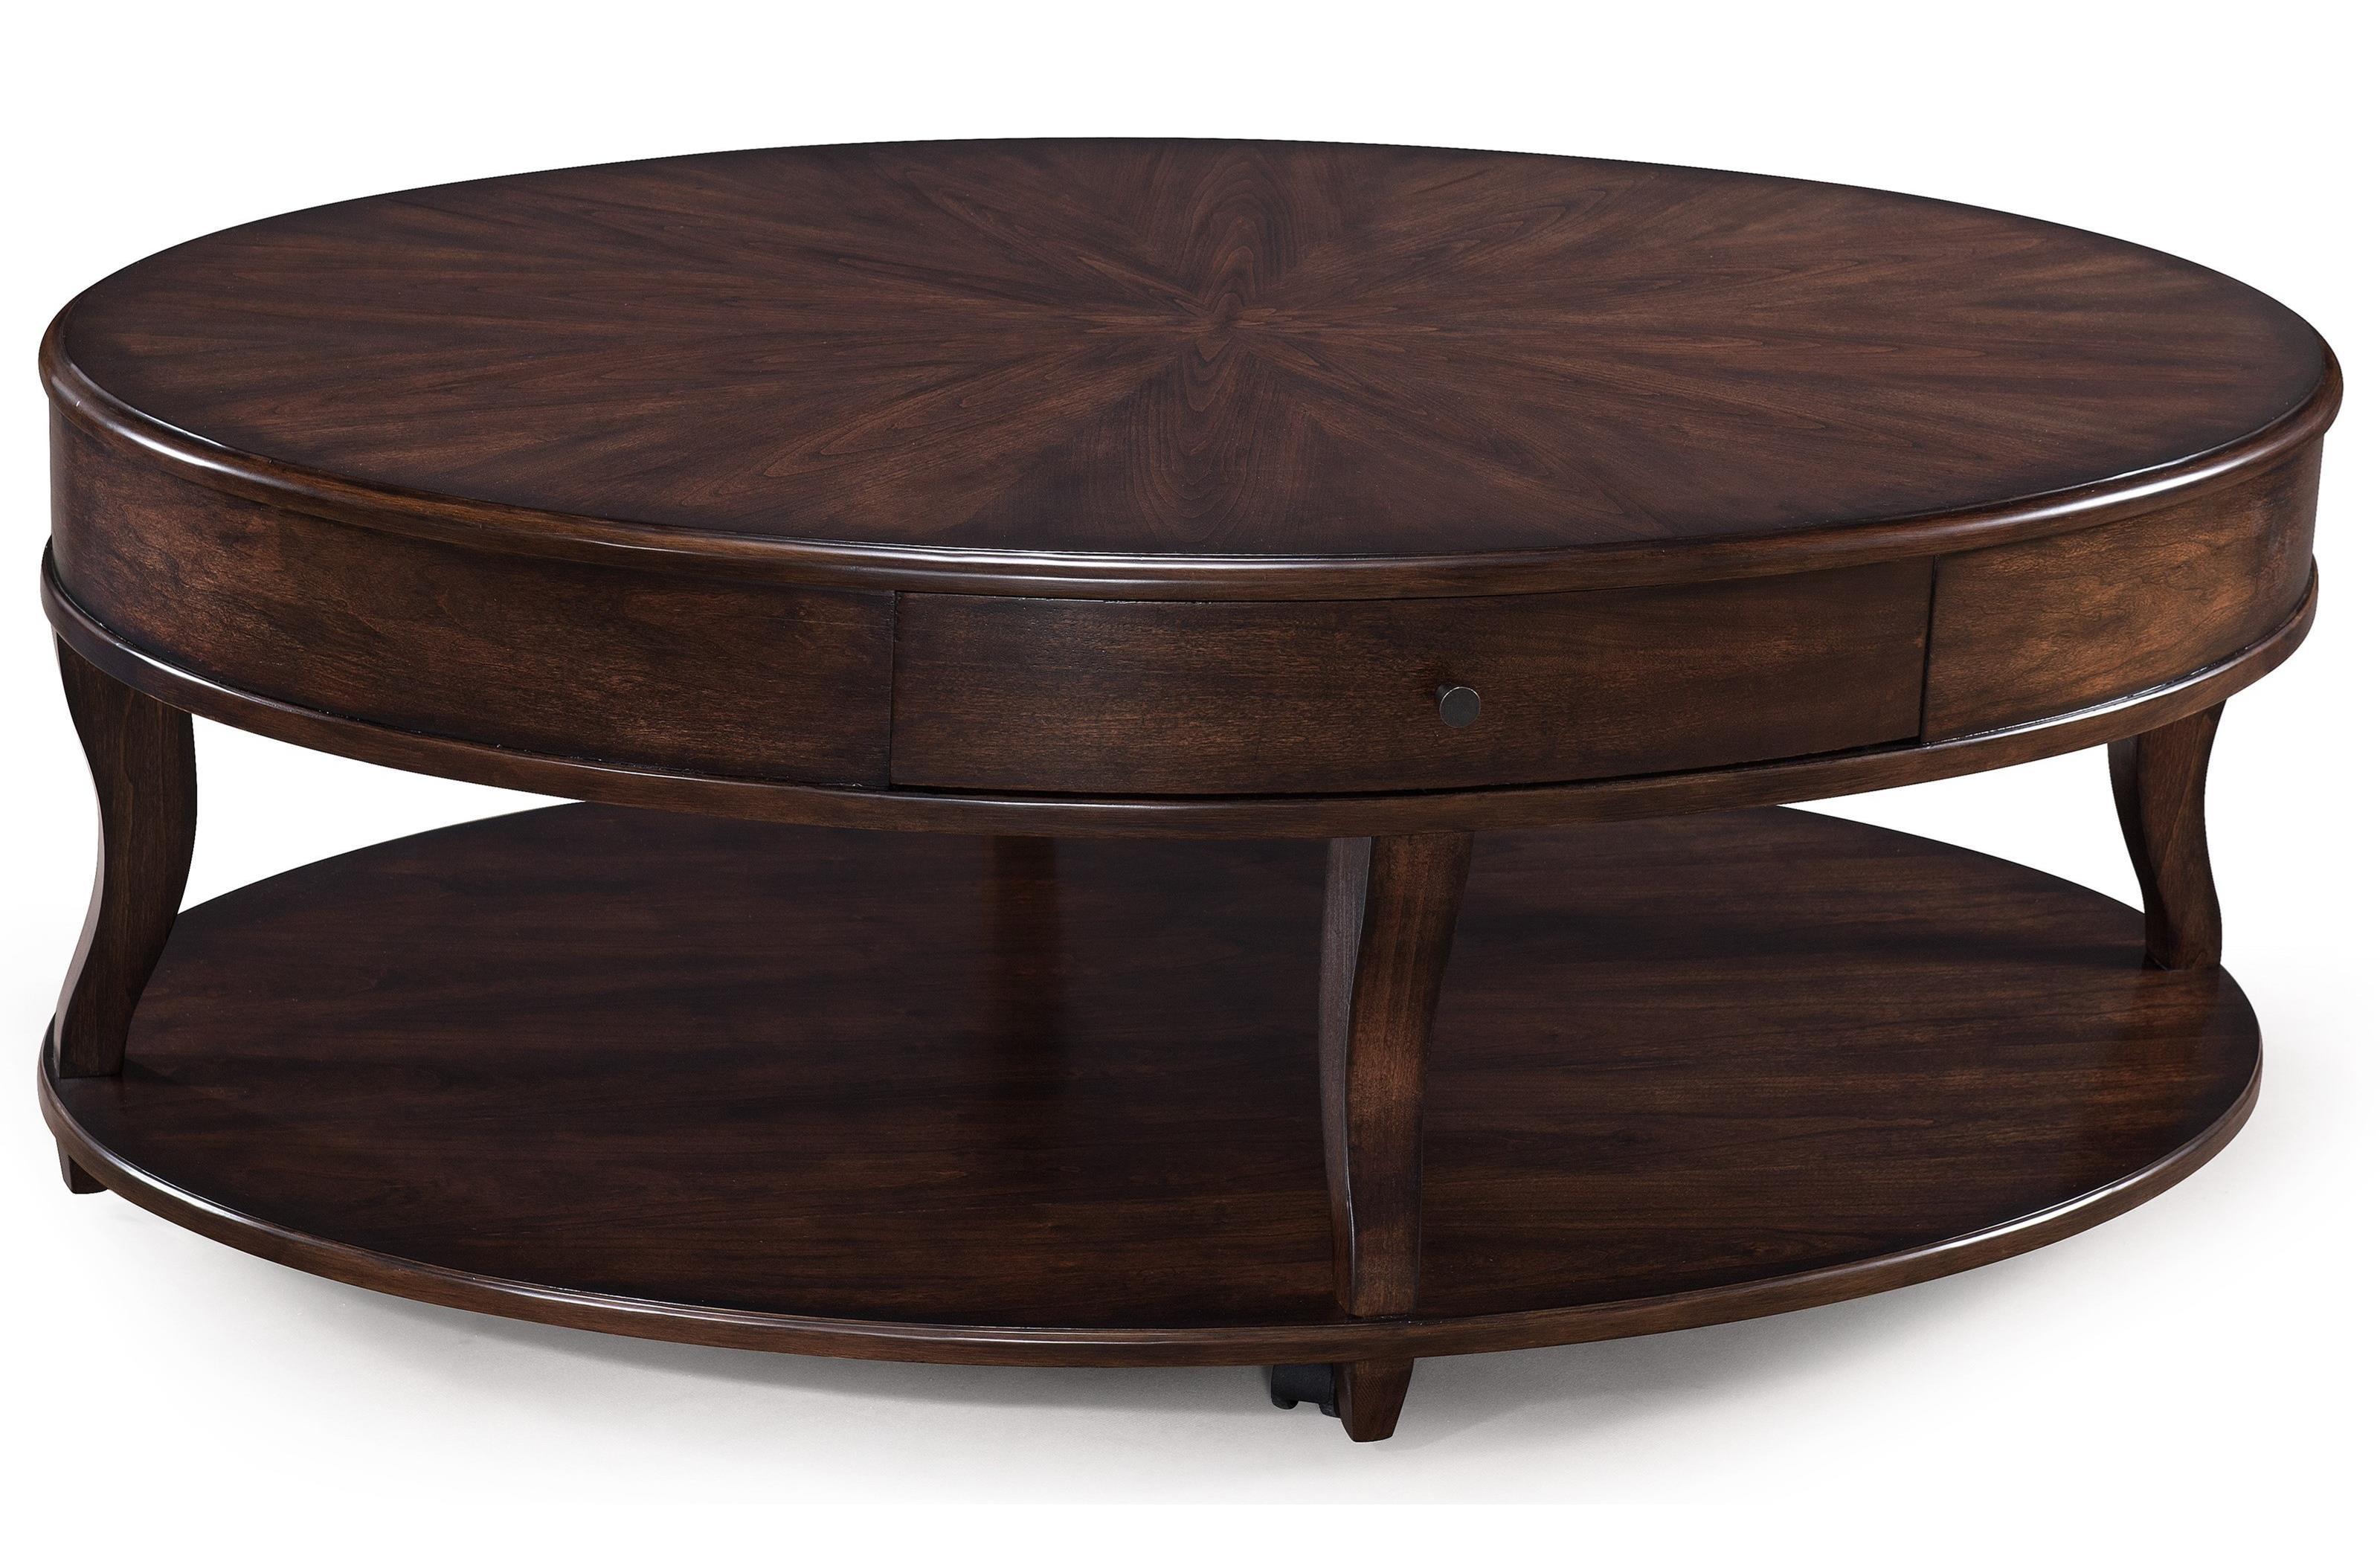 Magnussen Home Madelyn Oval Cocktail Table - Item Number: T3607-47